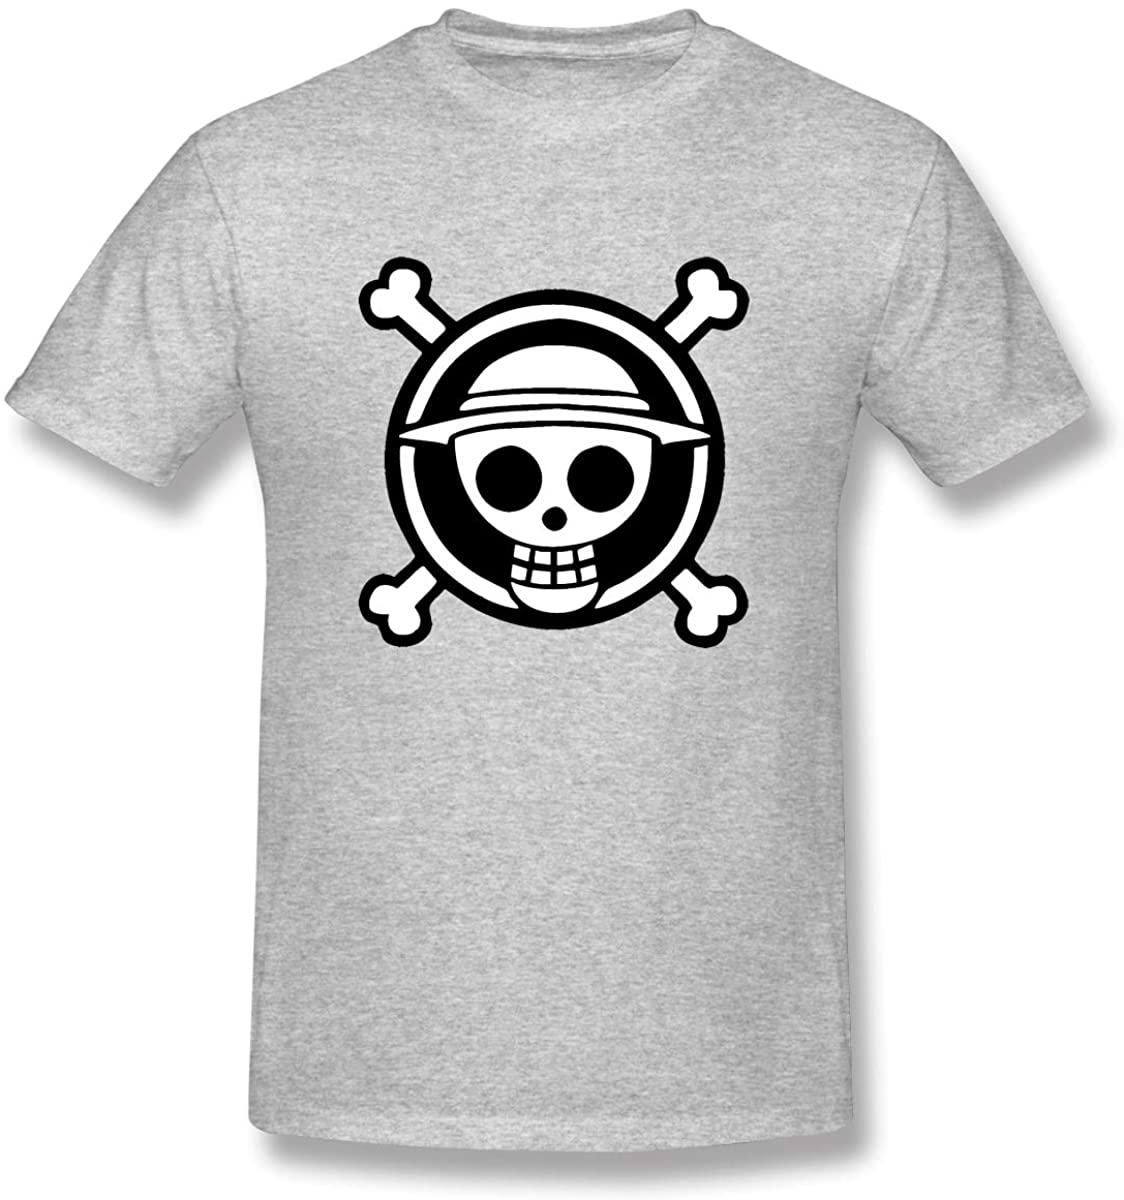 XIVEIER Design ONE Piece Logo Tee for Boyfriend Gray 3XL.